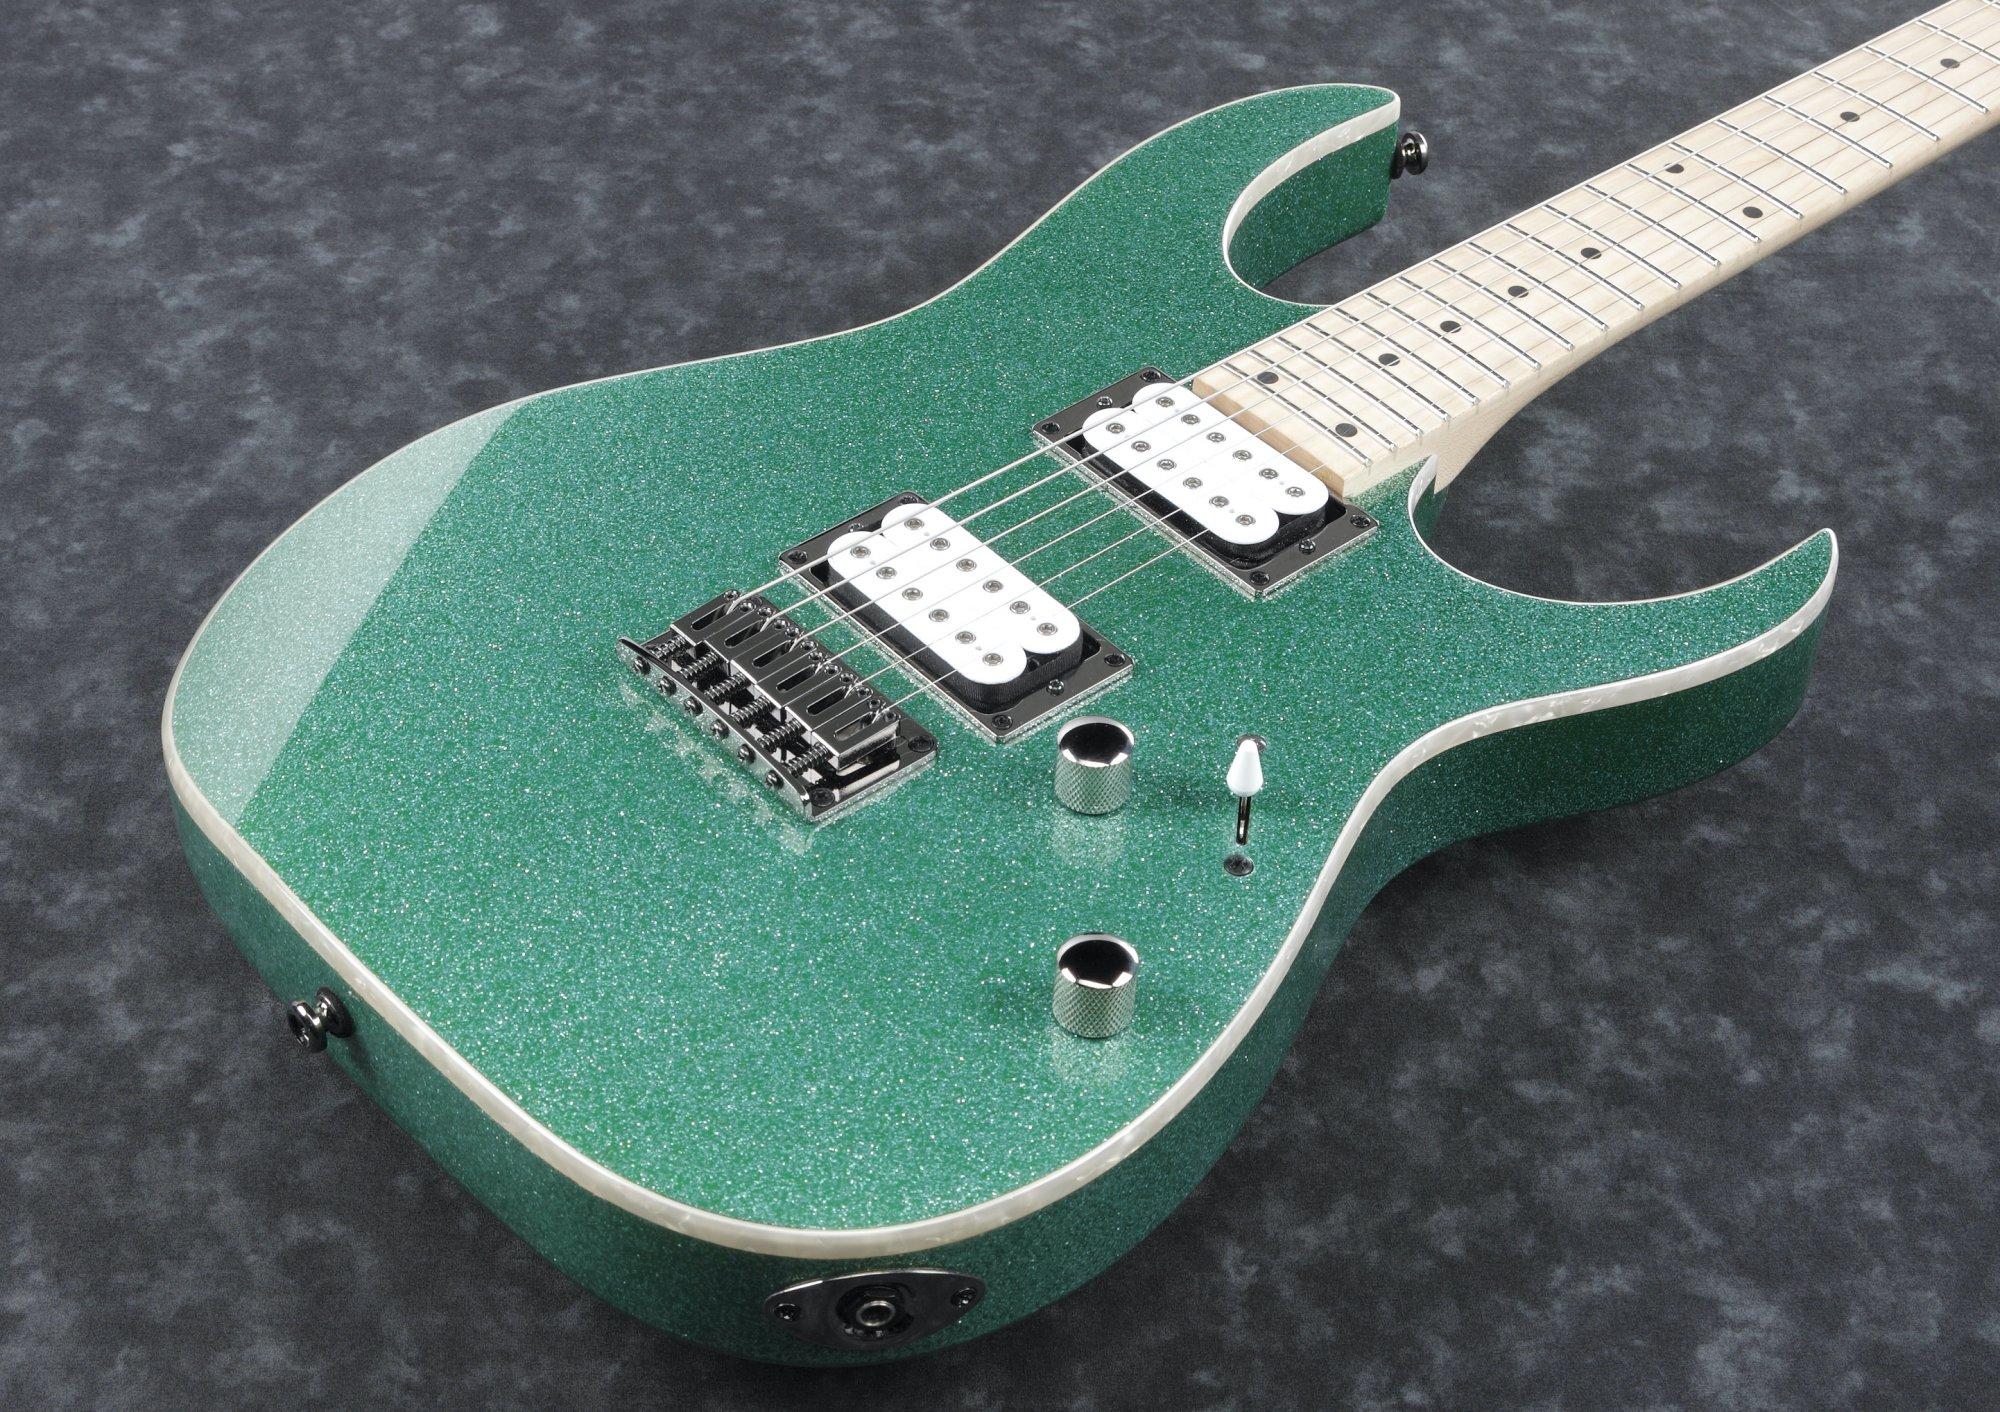 Ibanez RG Standard 6str Electric Guitar - Turquoise Sparkle